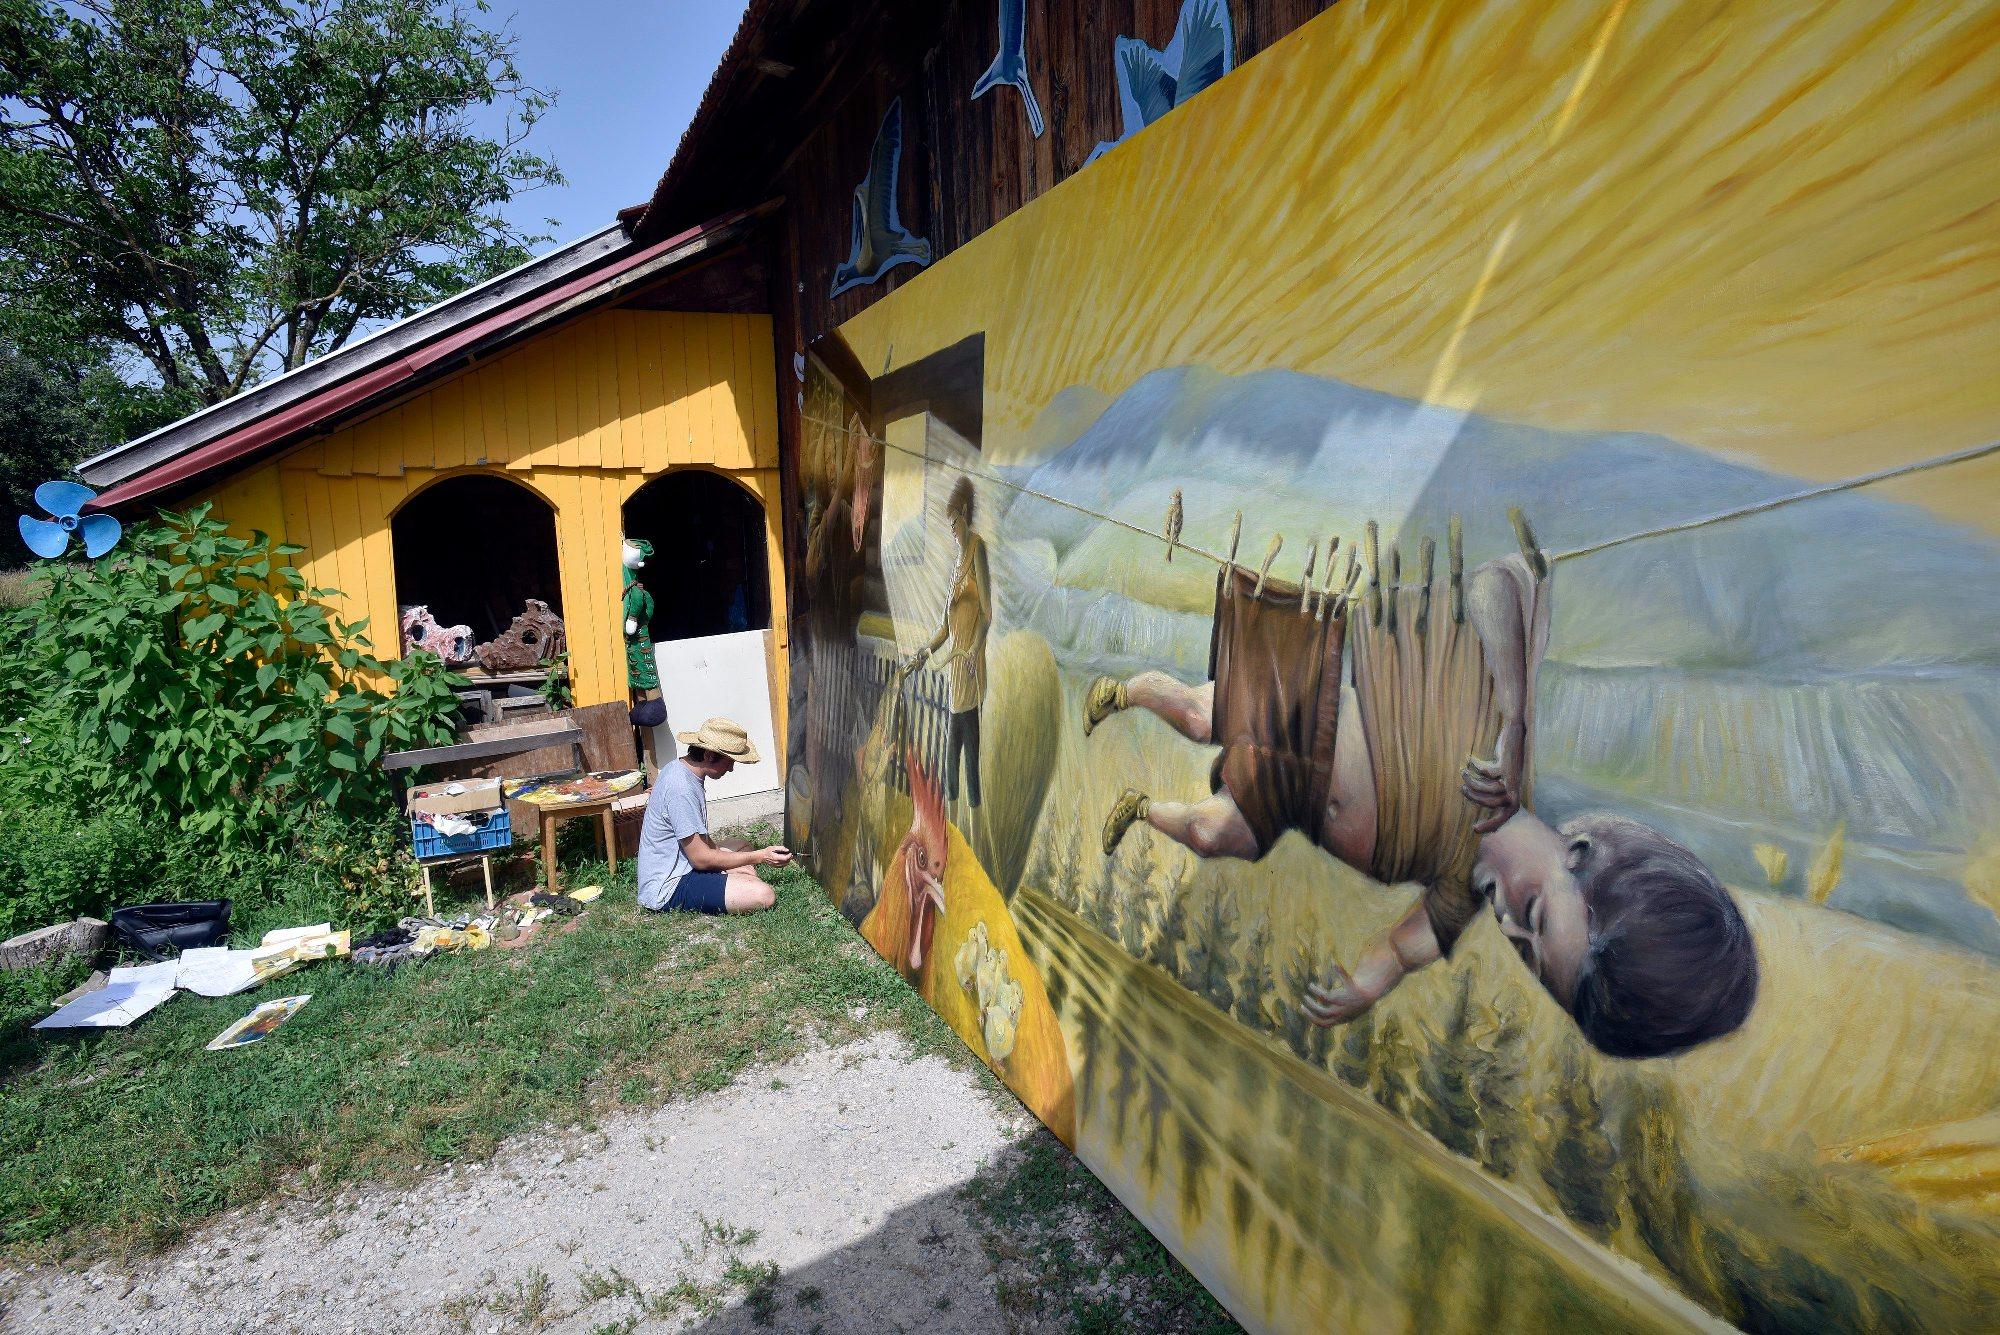 Dubrava kod Vrbovca, 120618. Kostanj 49. Zoran Jambresic, samouki slikar, clan umjetnicke kolonije slika sliku. Foto: Krasnodar Persun / CROPIX